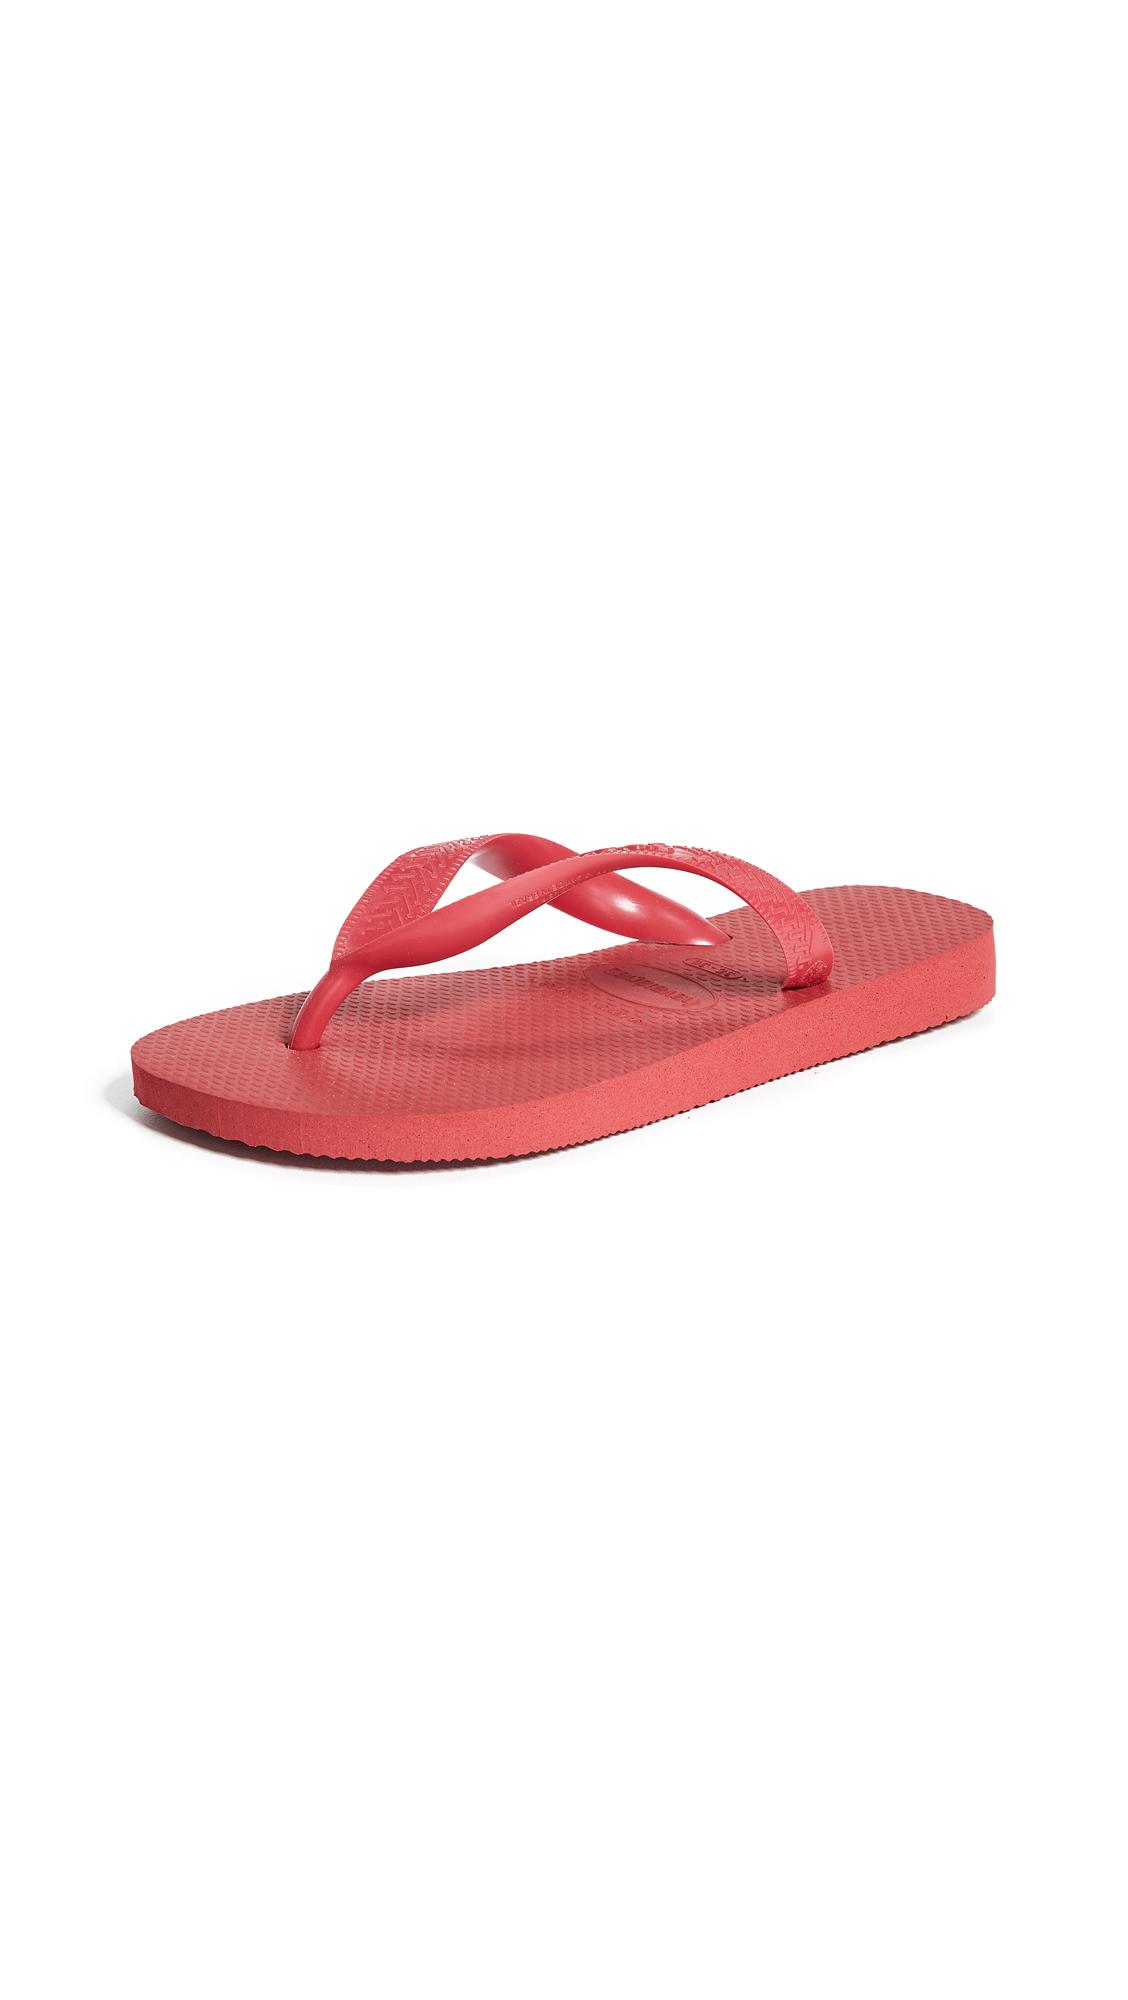 Havaianas Core Flip Flops - Ruby Red